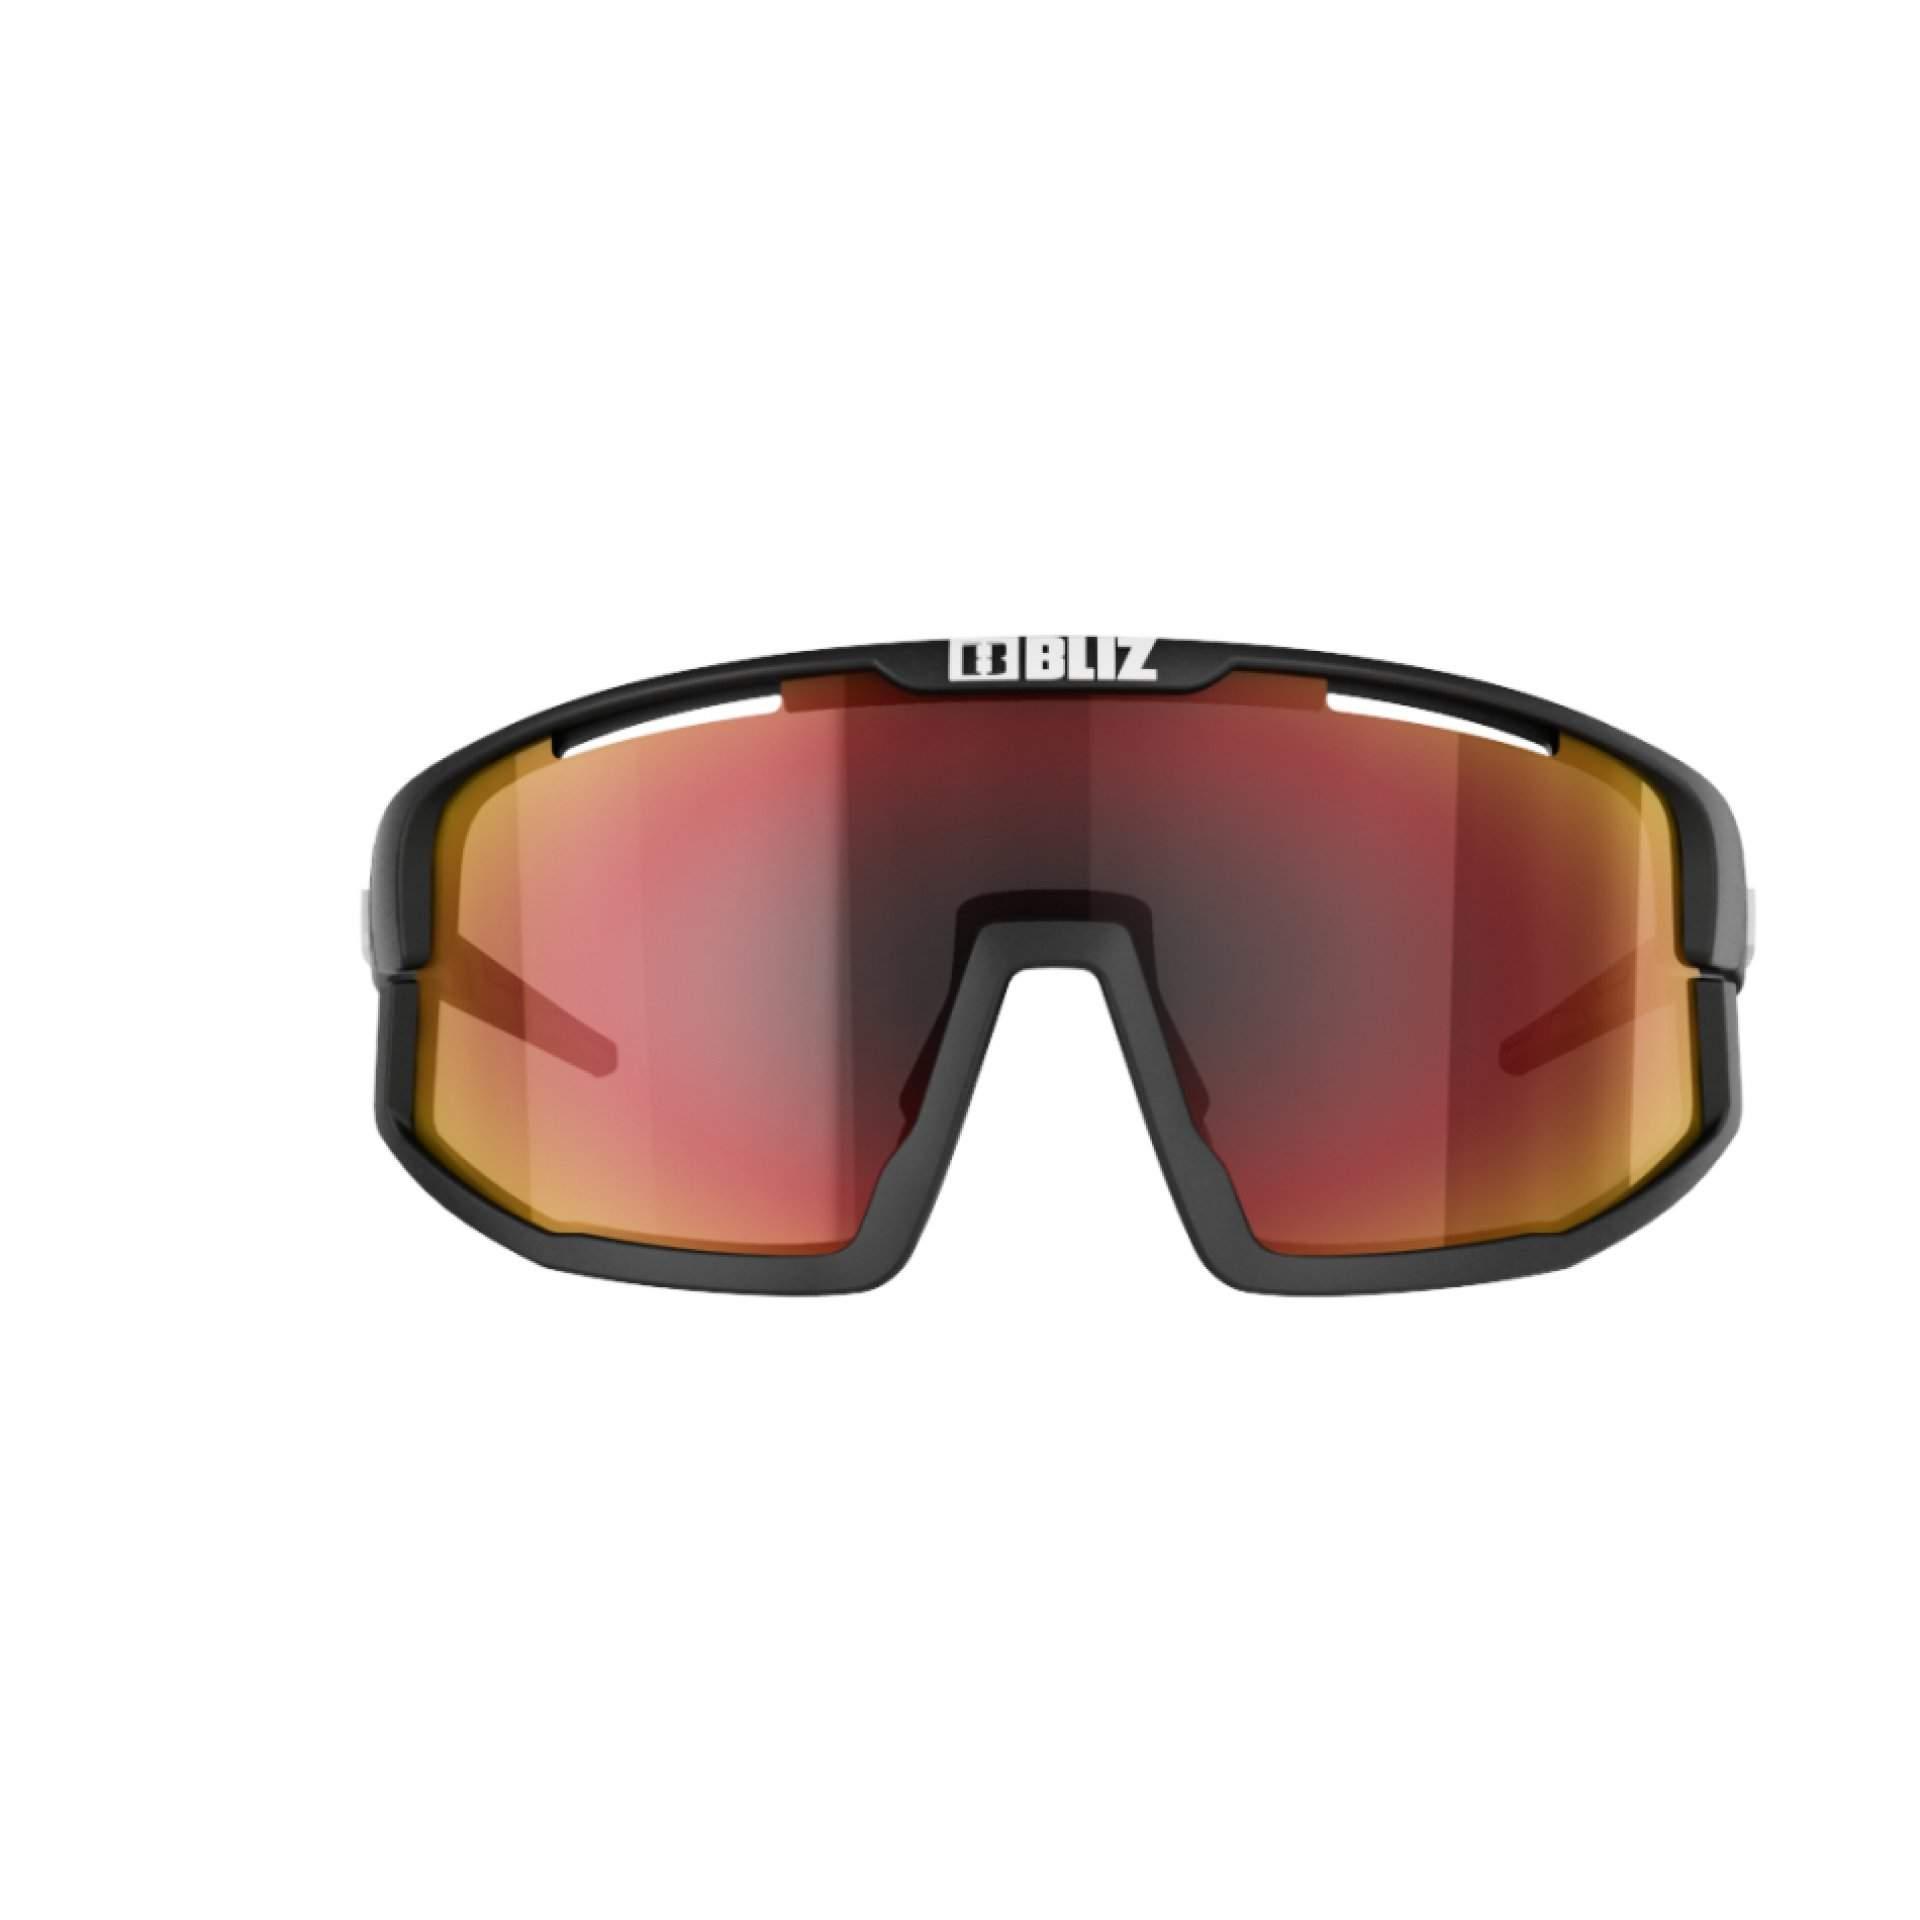 OKULARY BLIZ VISION BLACK BROWN W RED MULTI 52001 14 Z PRZODU